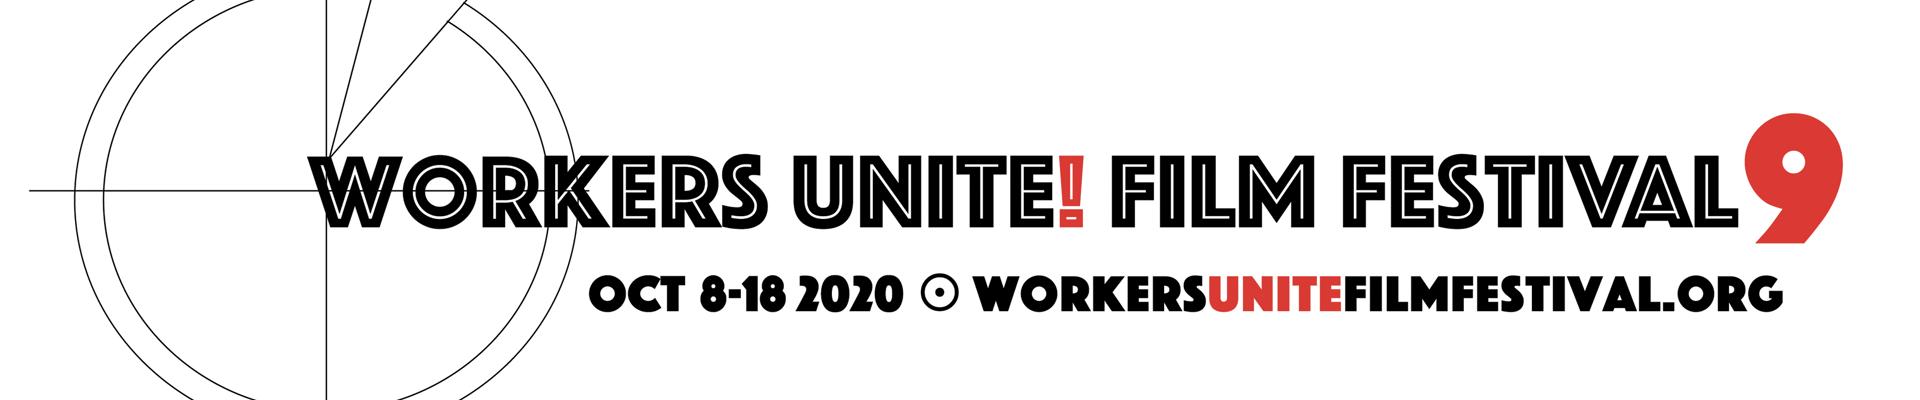 2020 Workers Unite Film Festival